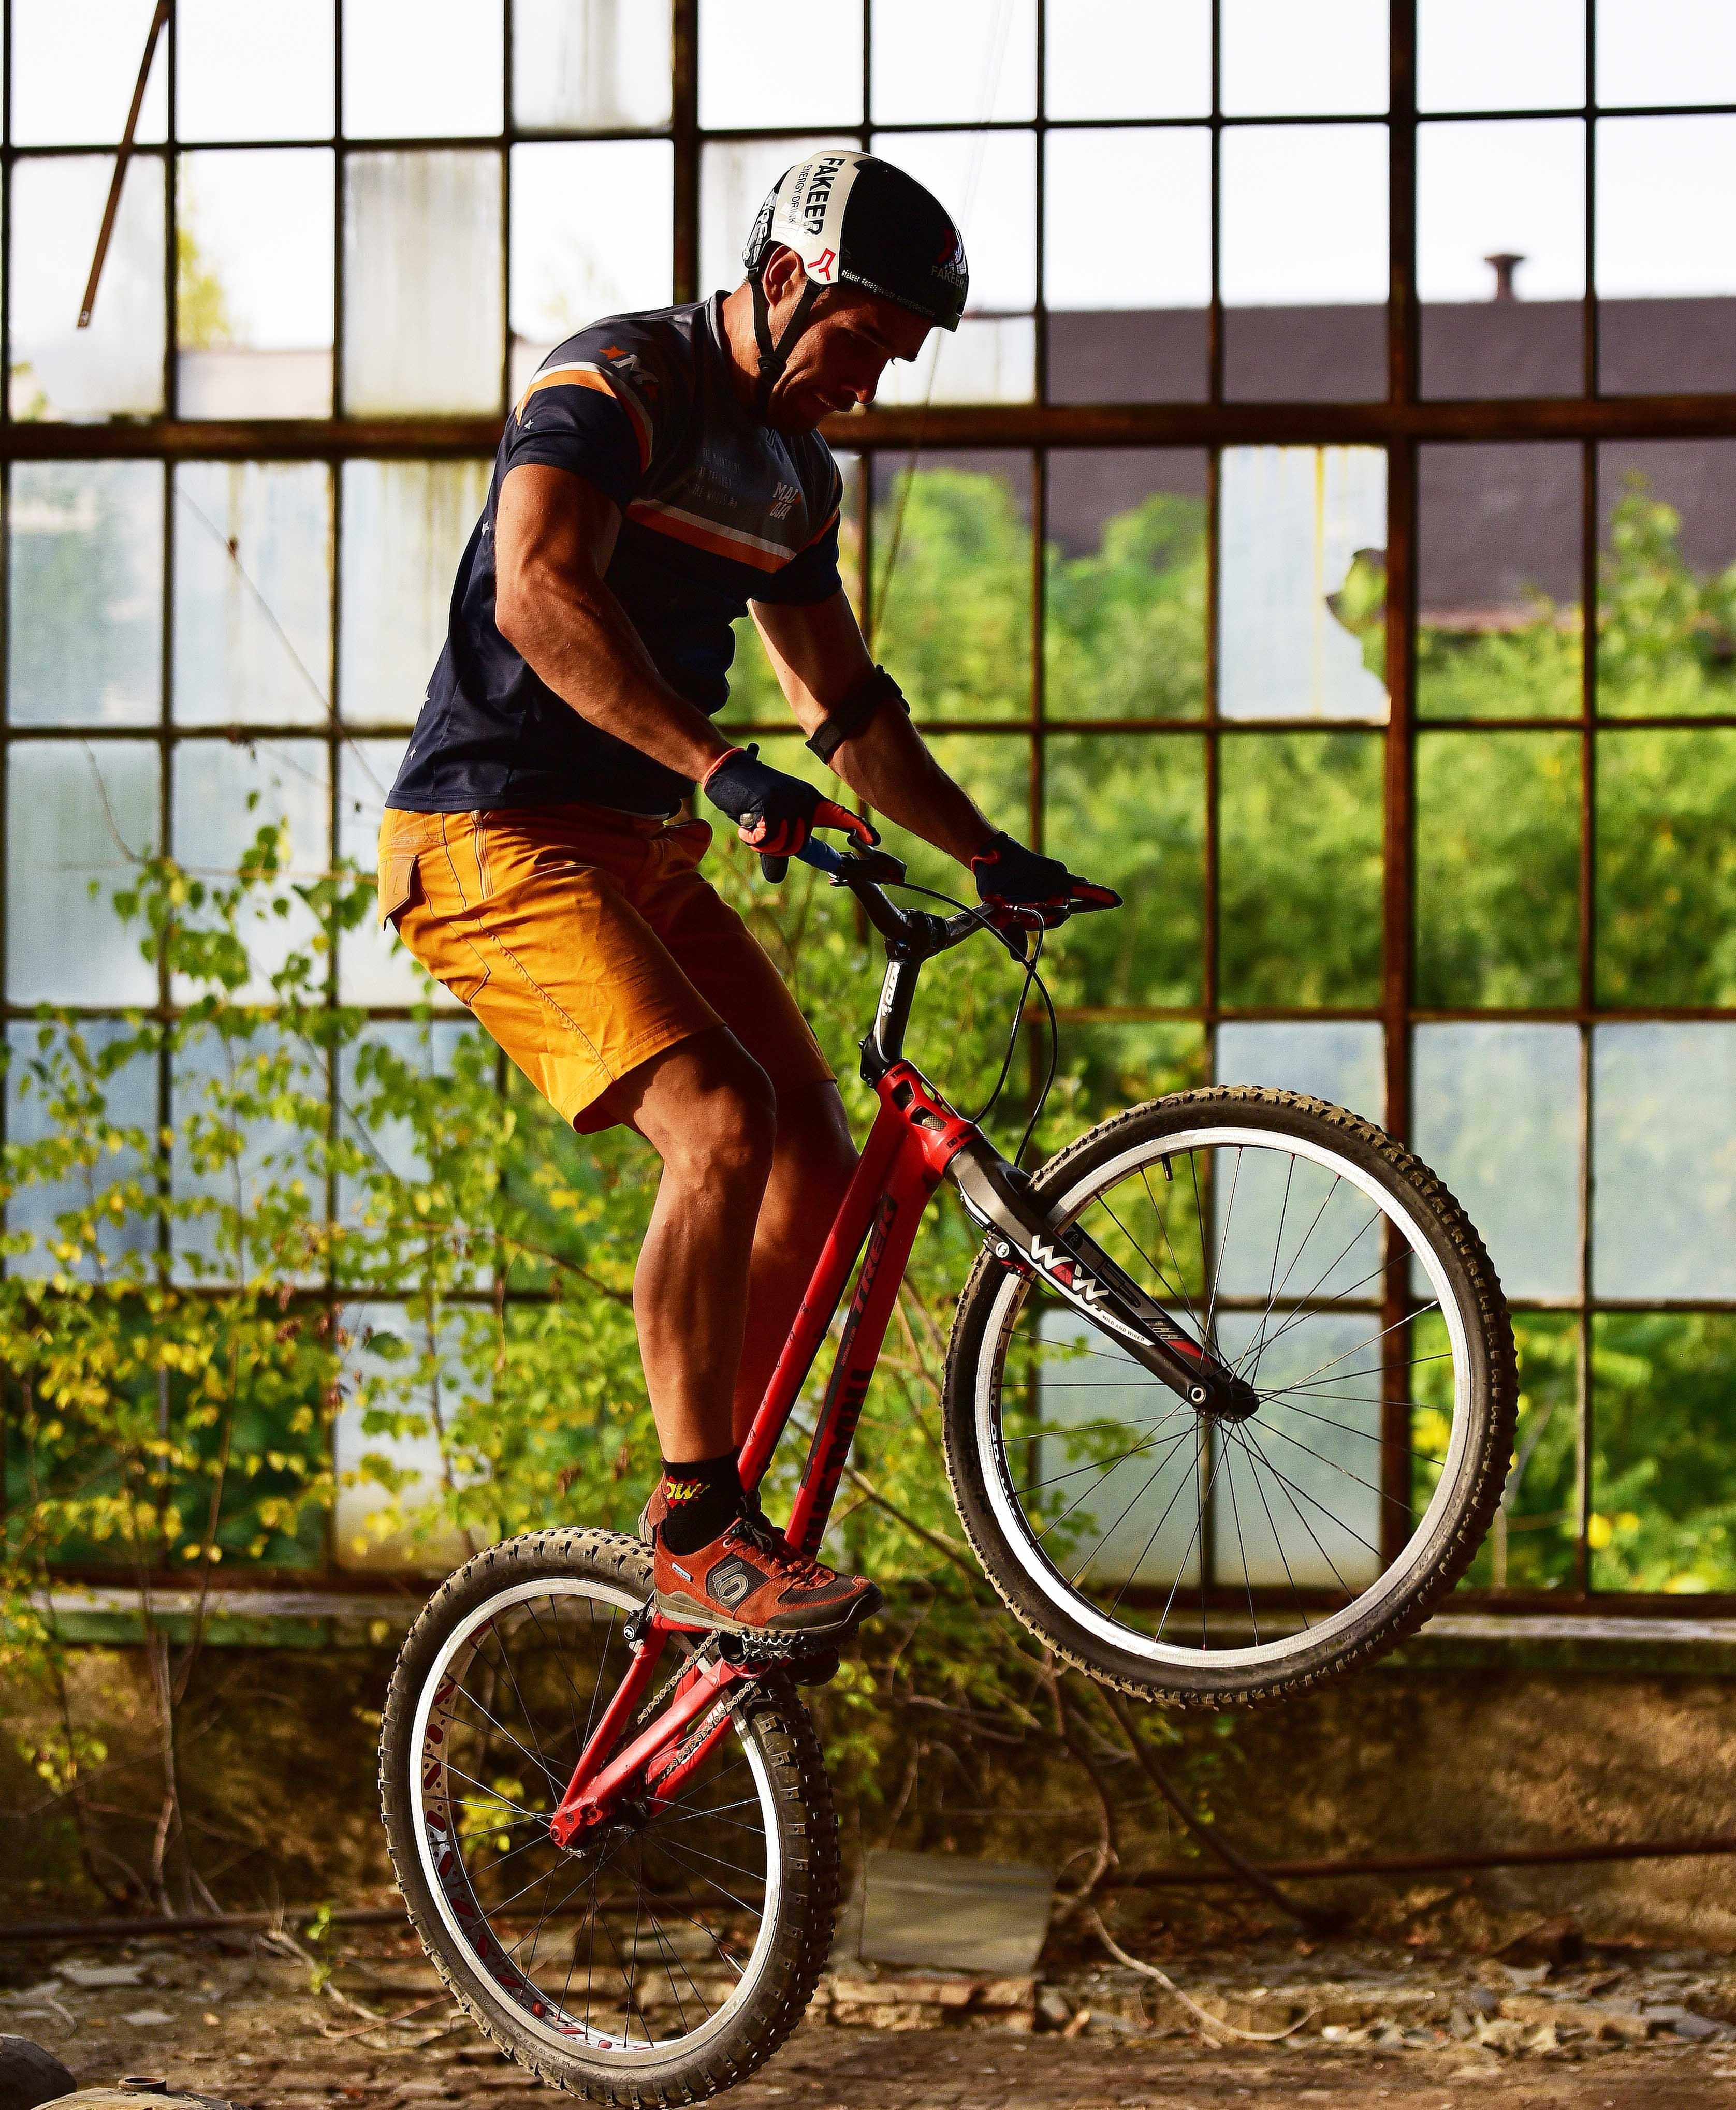 Vlasta Cihacek Mitas Bike Rider